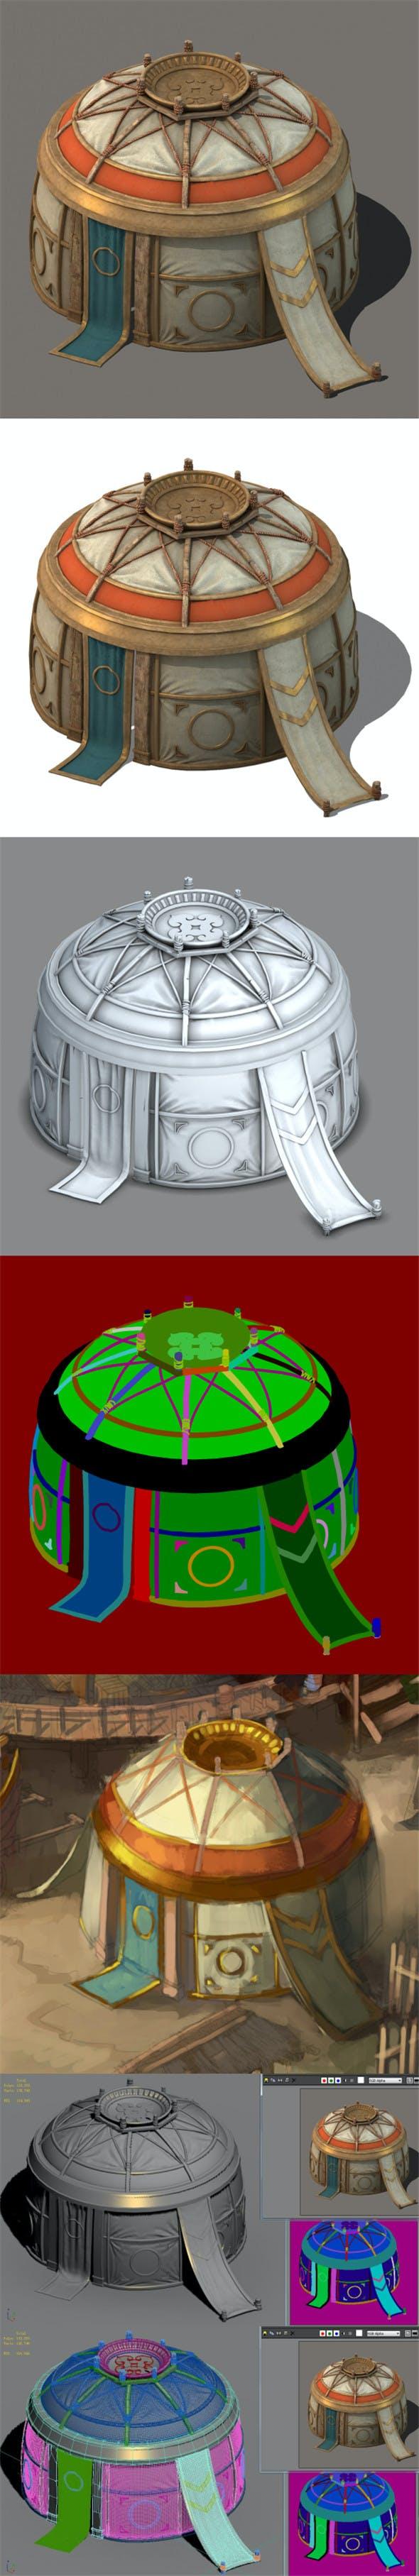 Prairie Architecture - Tent 02 - 3DOcean Item for Sale